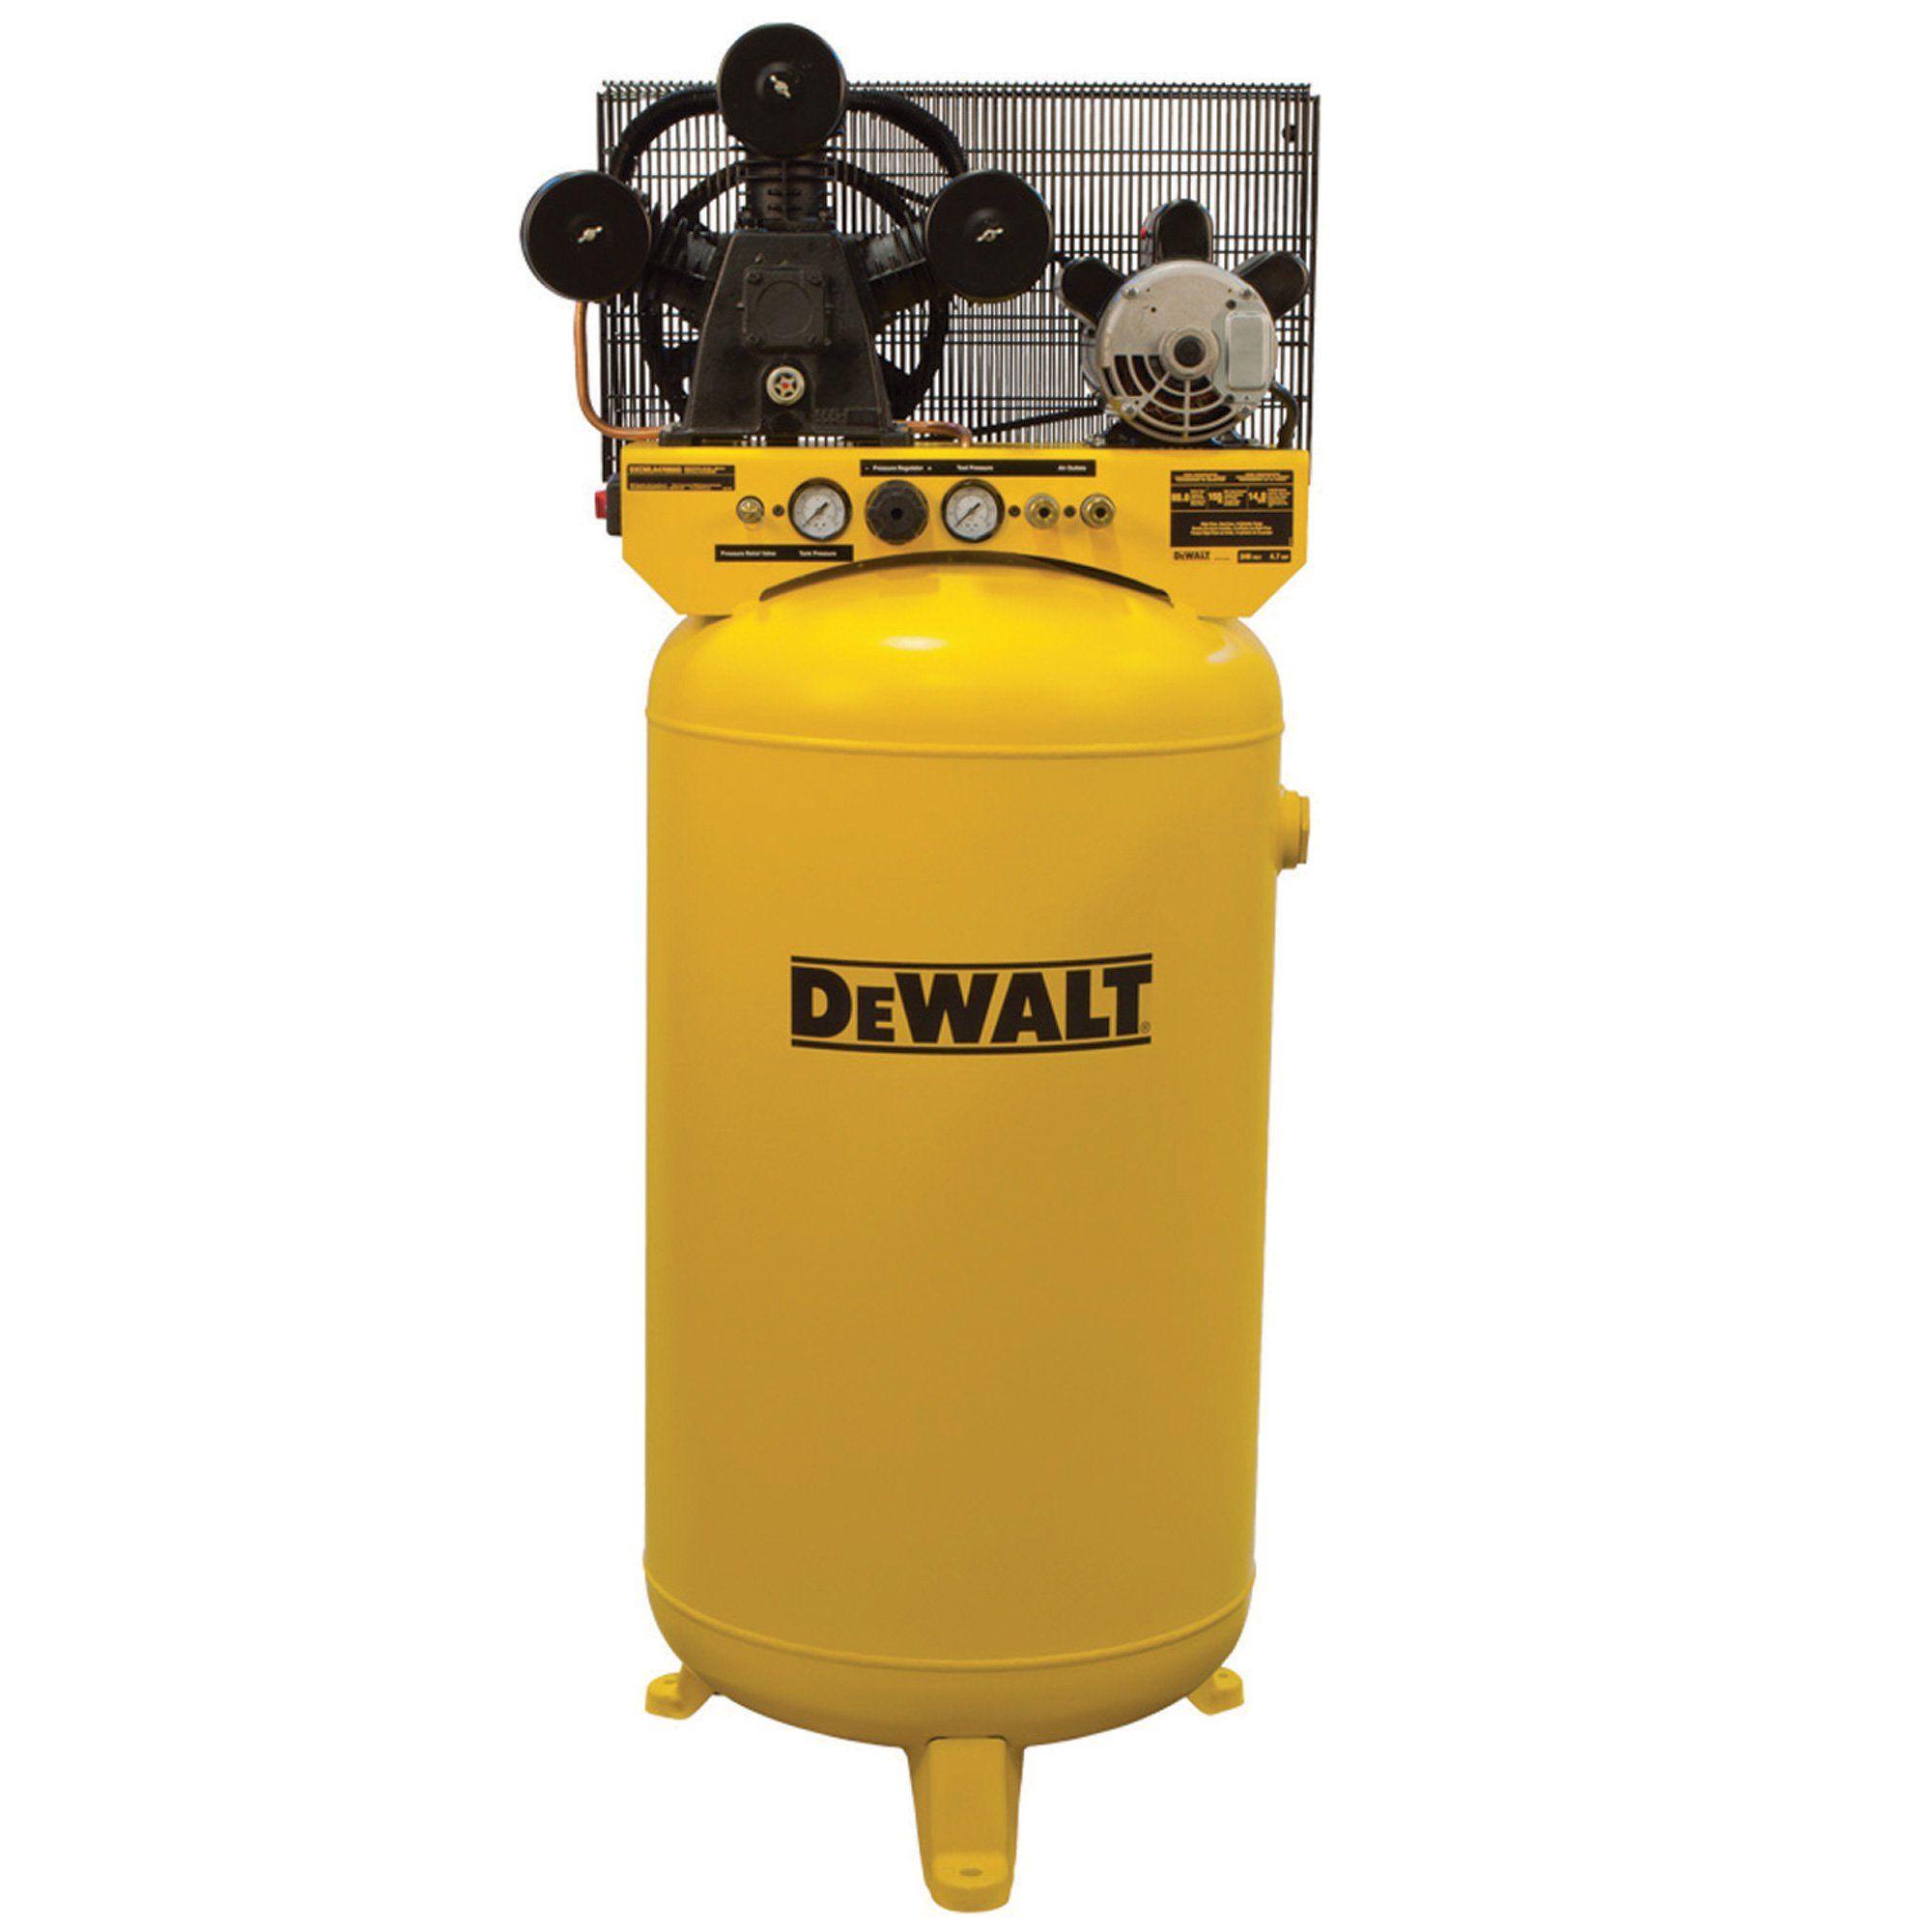 DeWALT Vertical Air Compressor 80 Gallon, HiFlo, Single